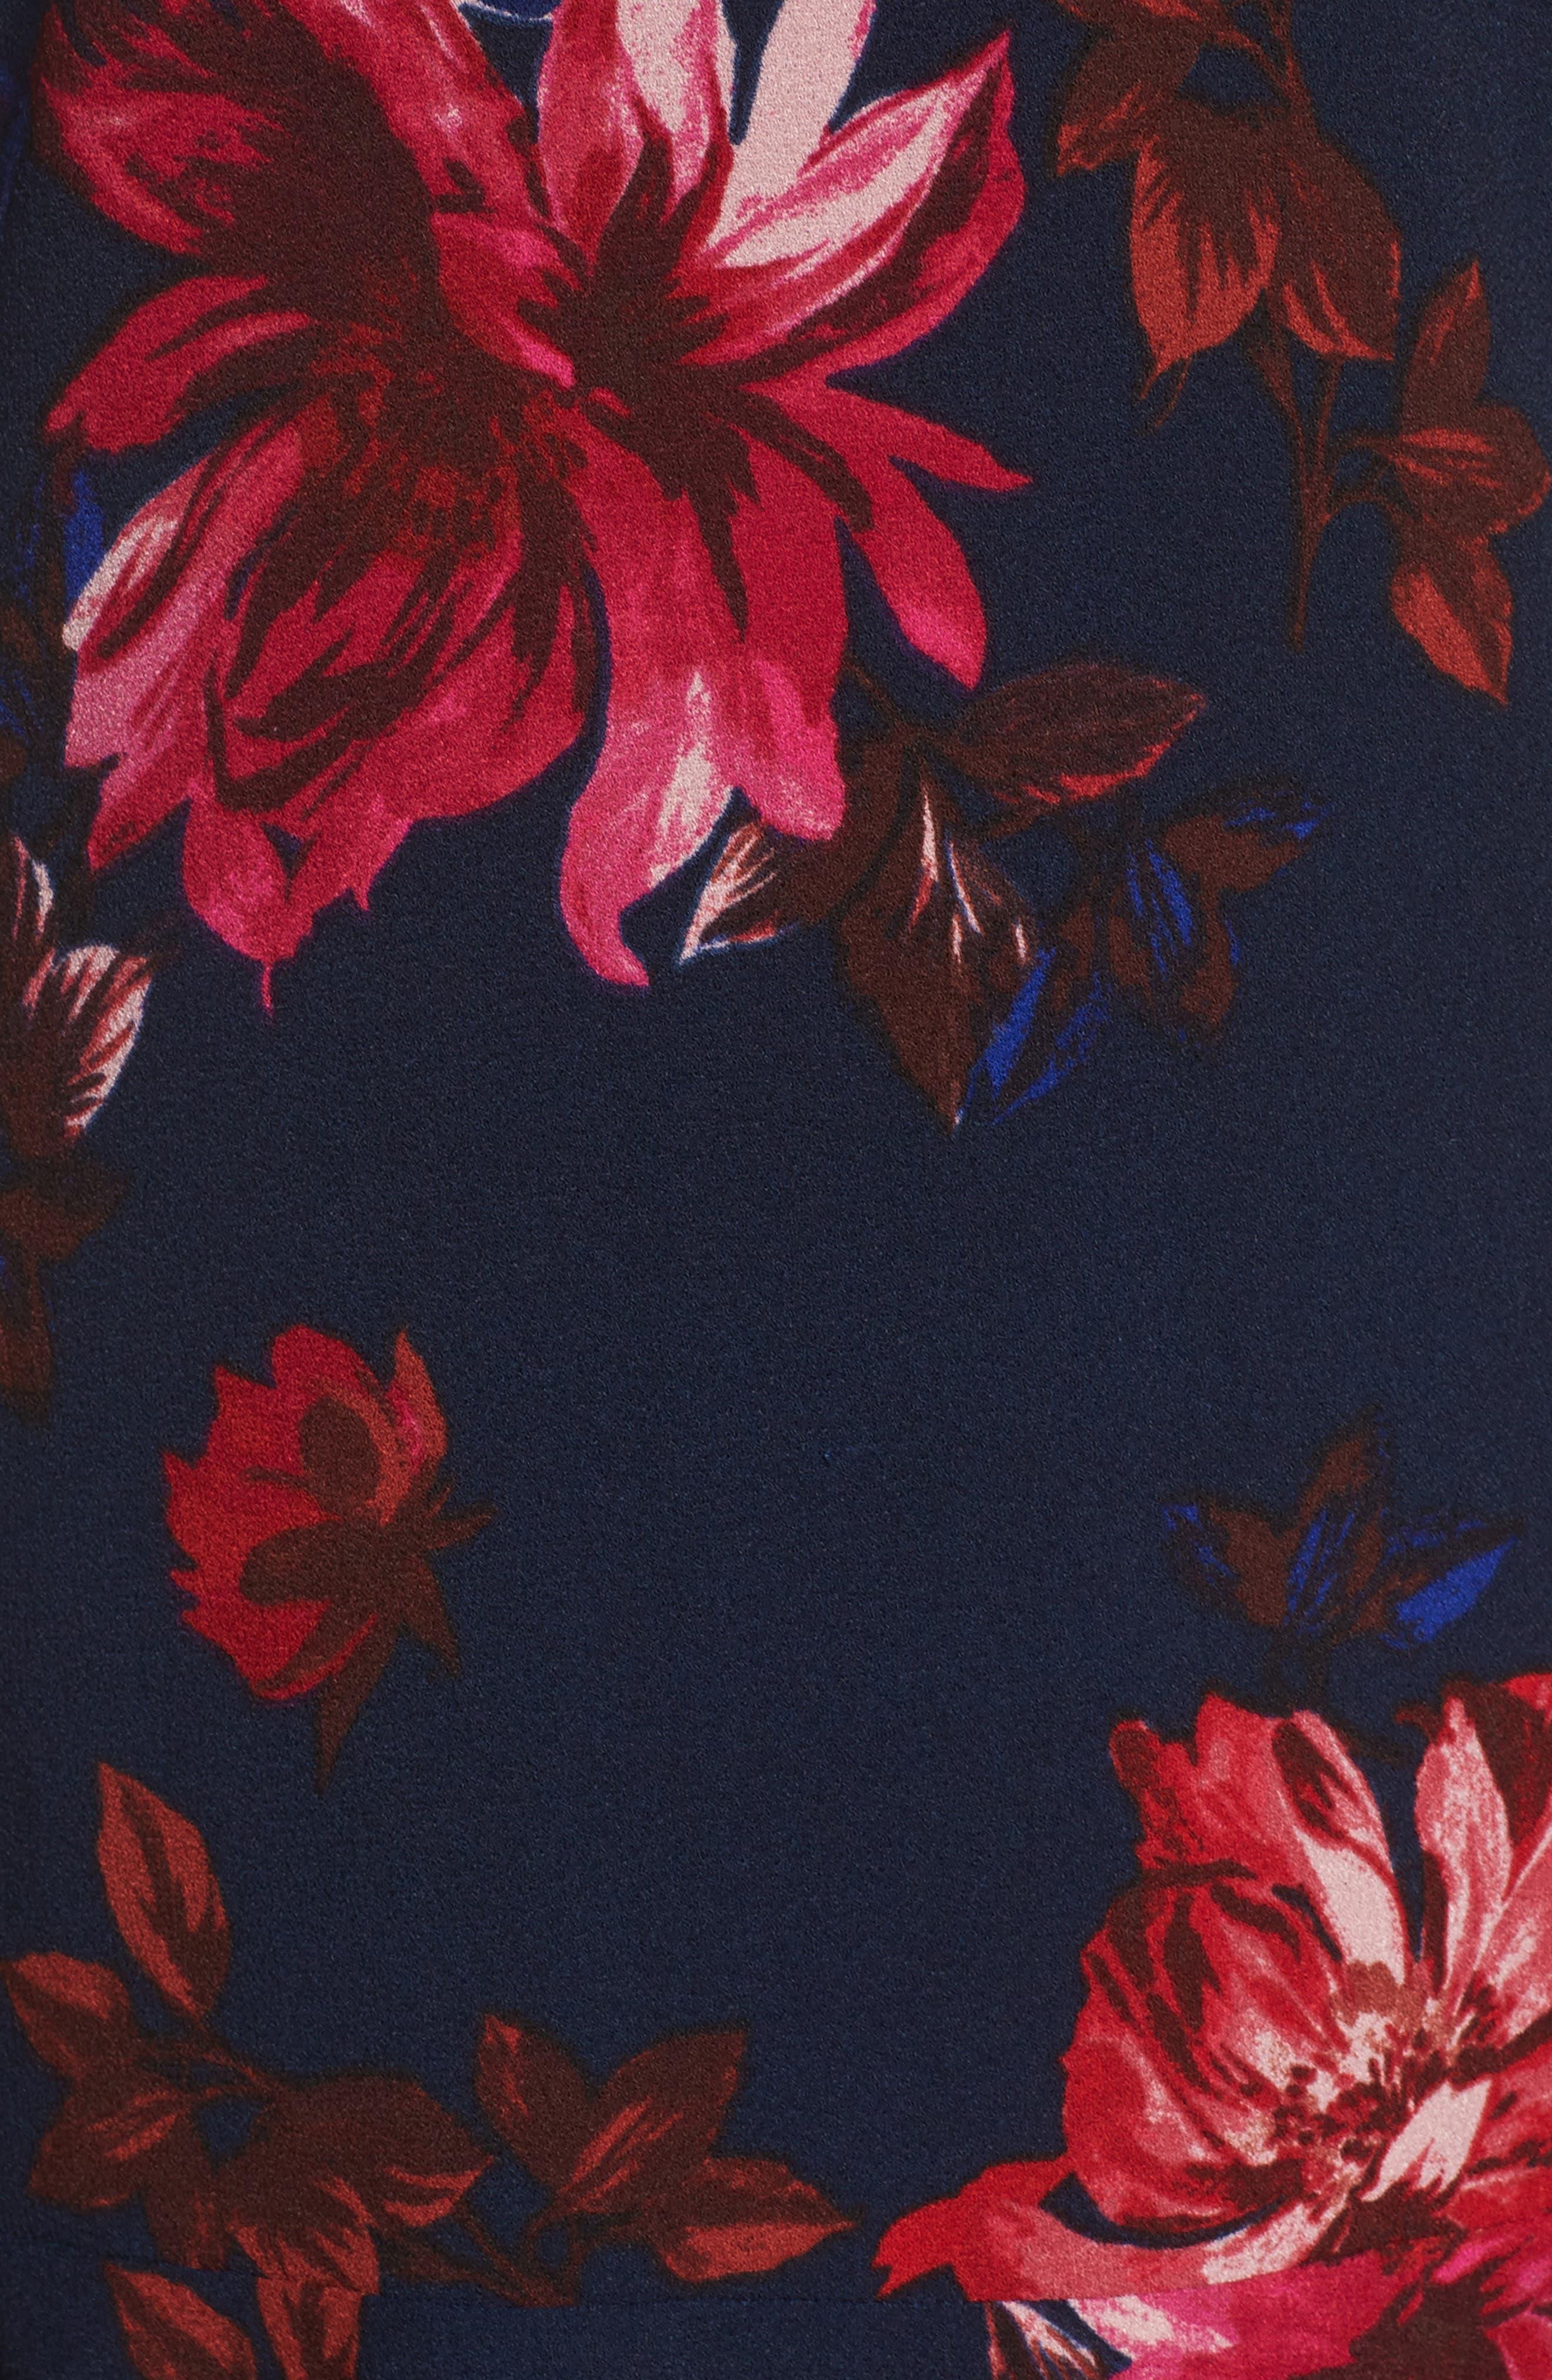 Floral Shift Dress,                             Alternate thumbnail 5, color,                             Navy Floral